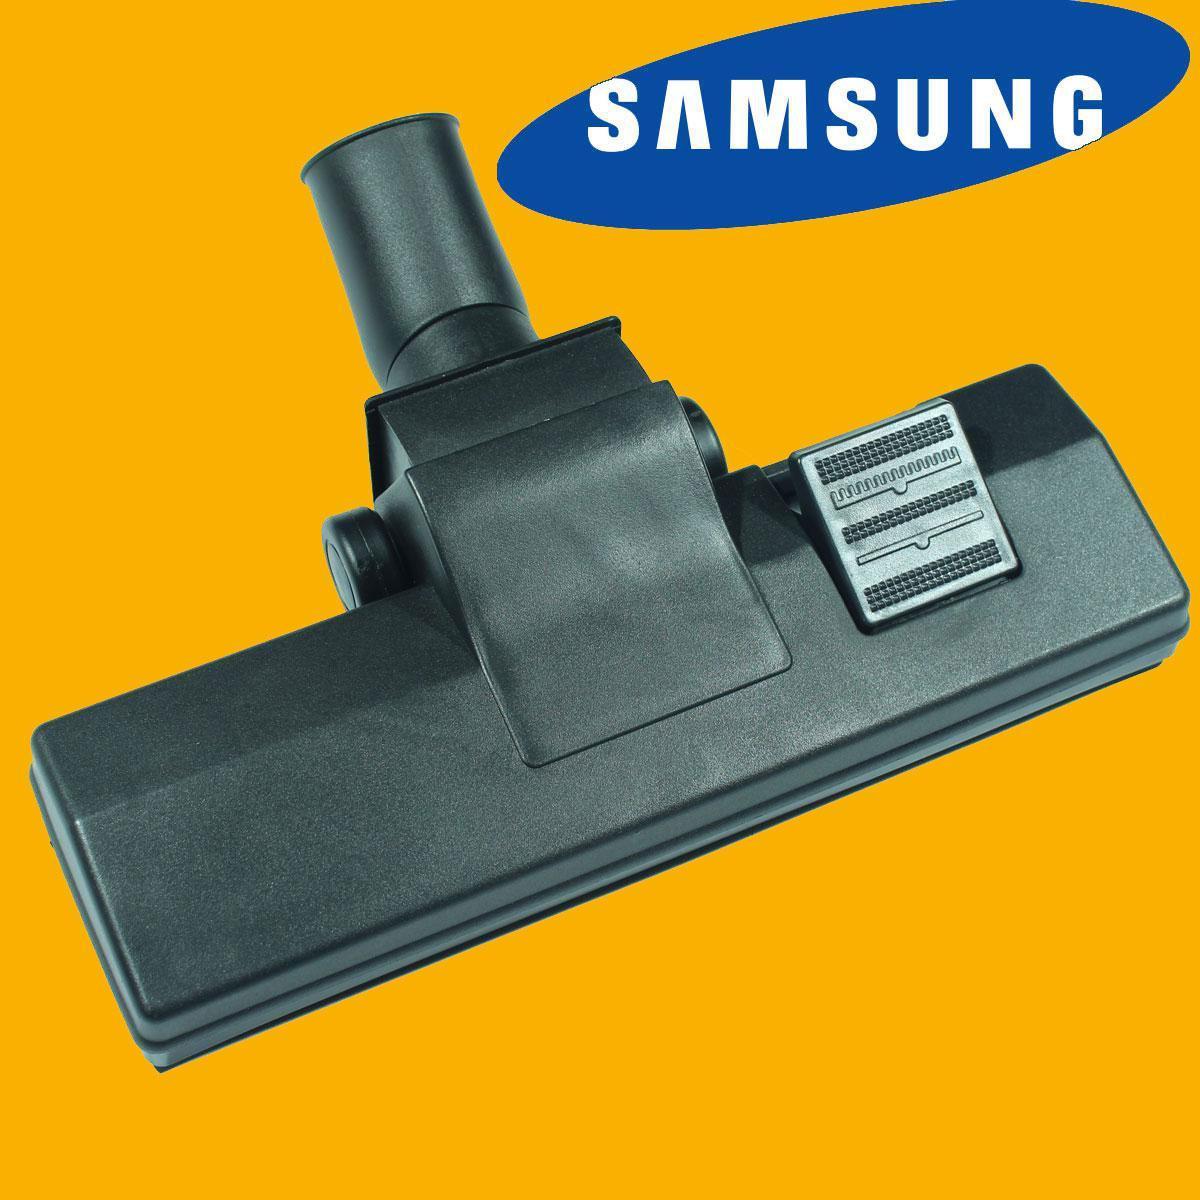 Щётка пылесоса Samsung на 35 мм